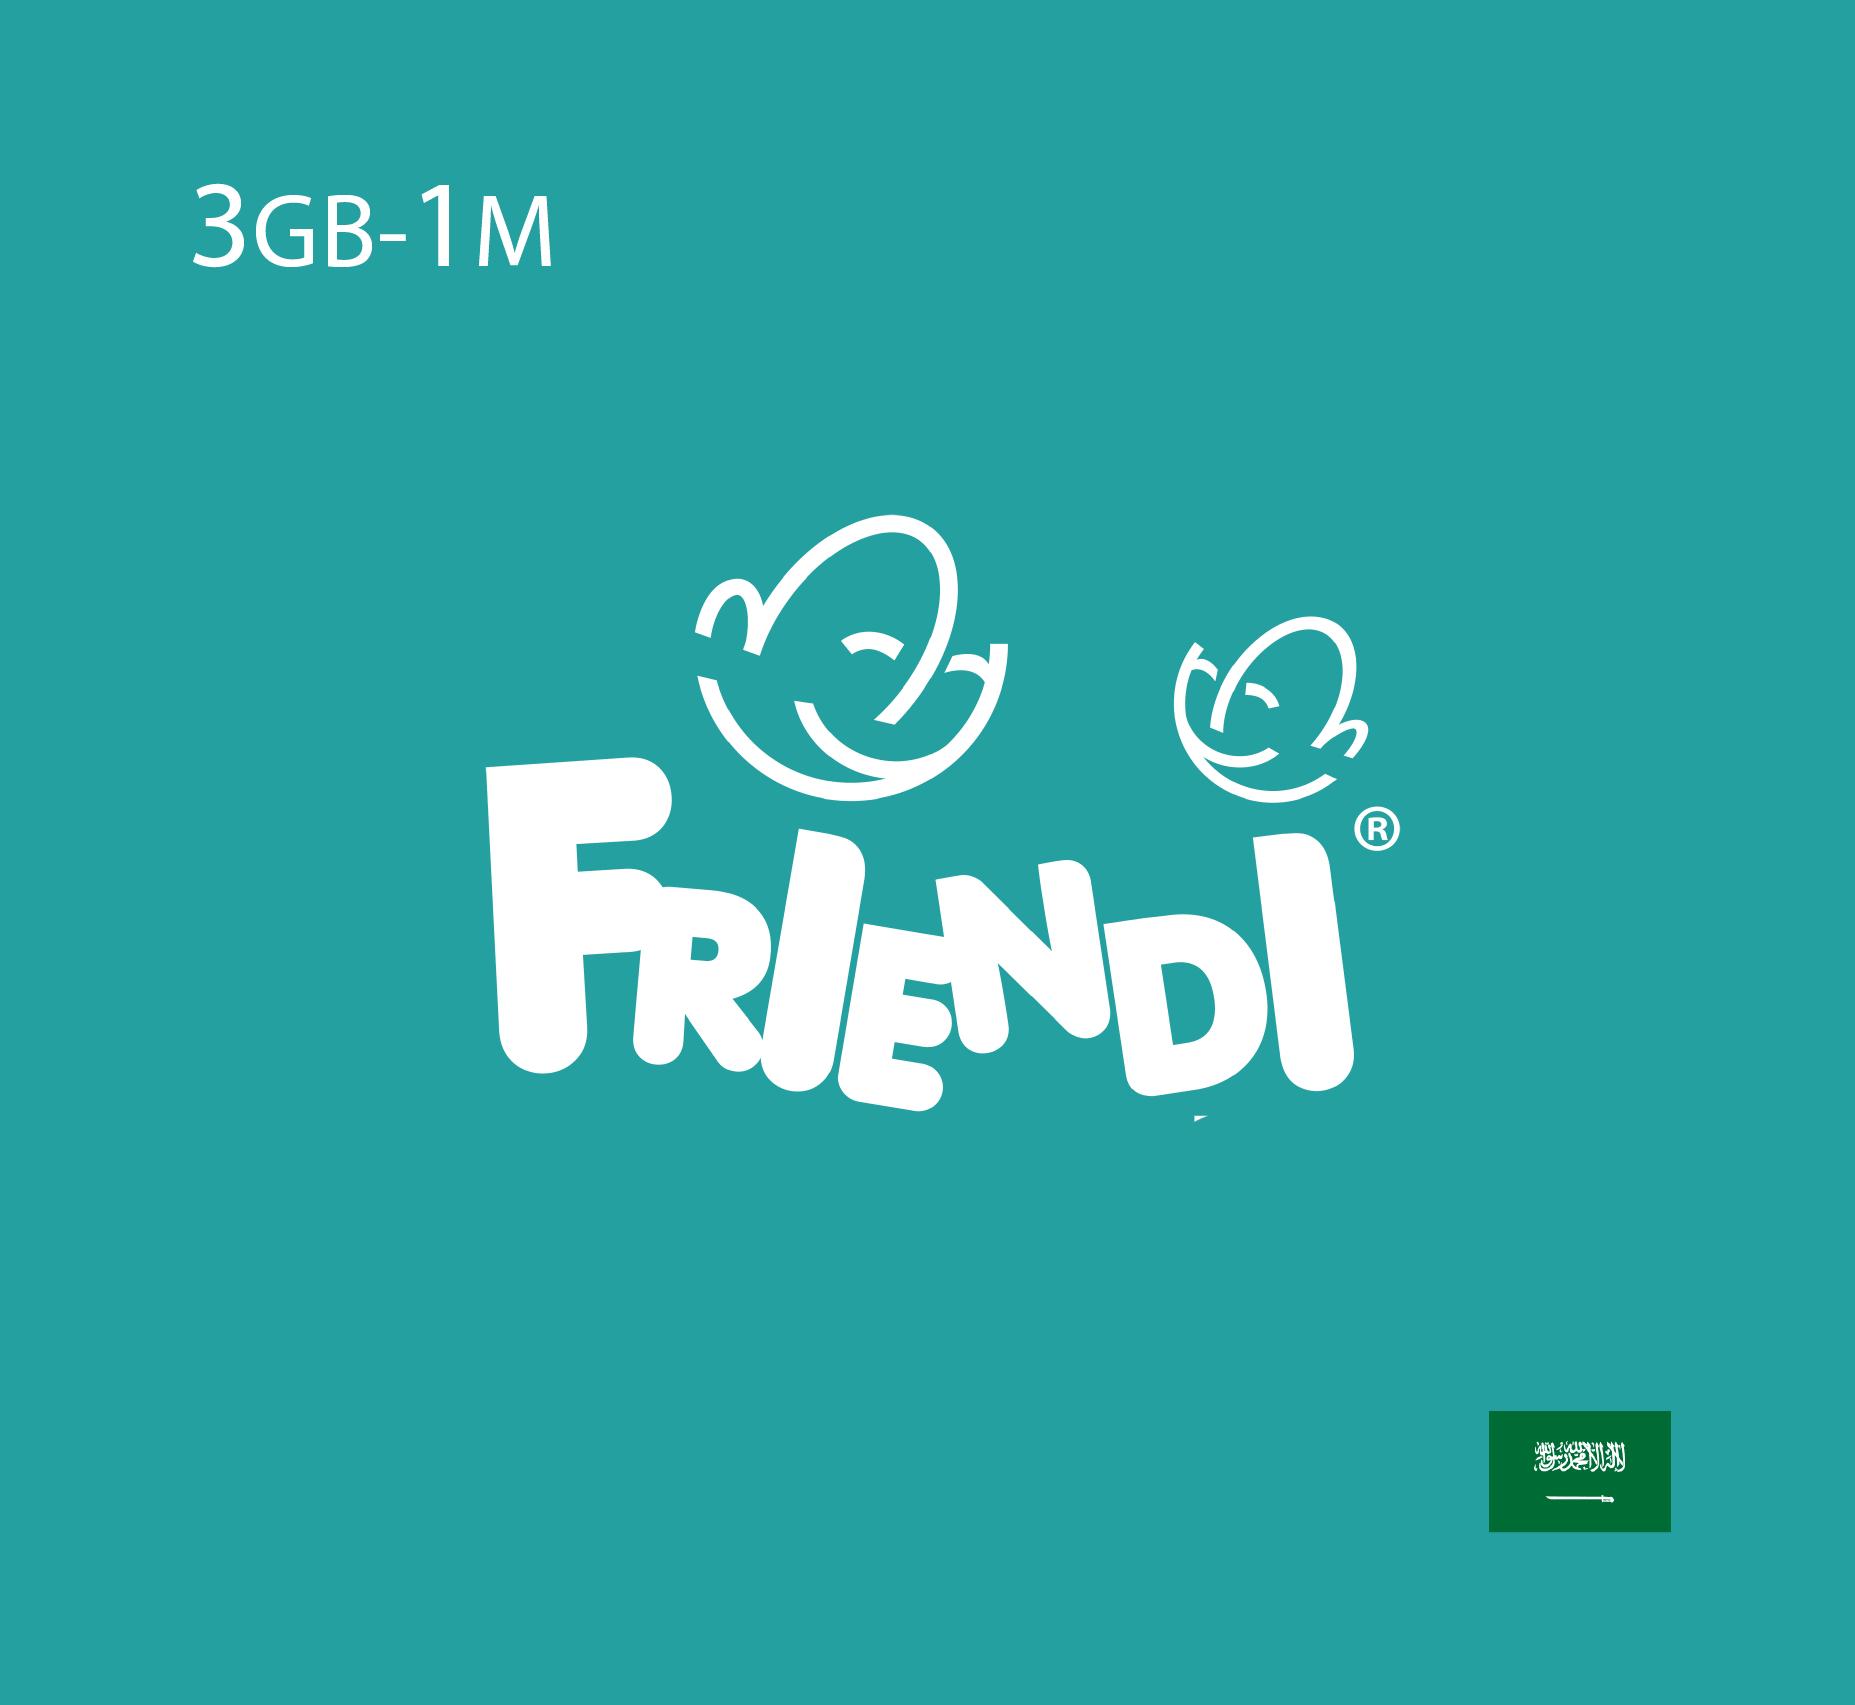 Friendi Data Recharge 3 GB - 1 Month